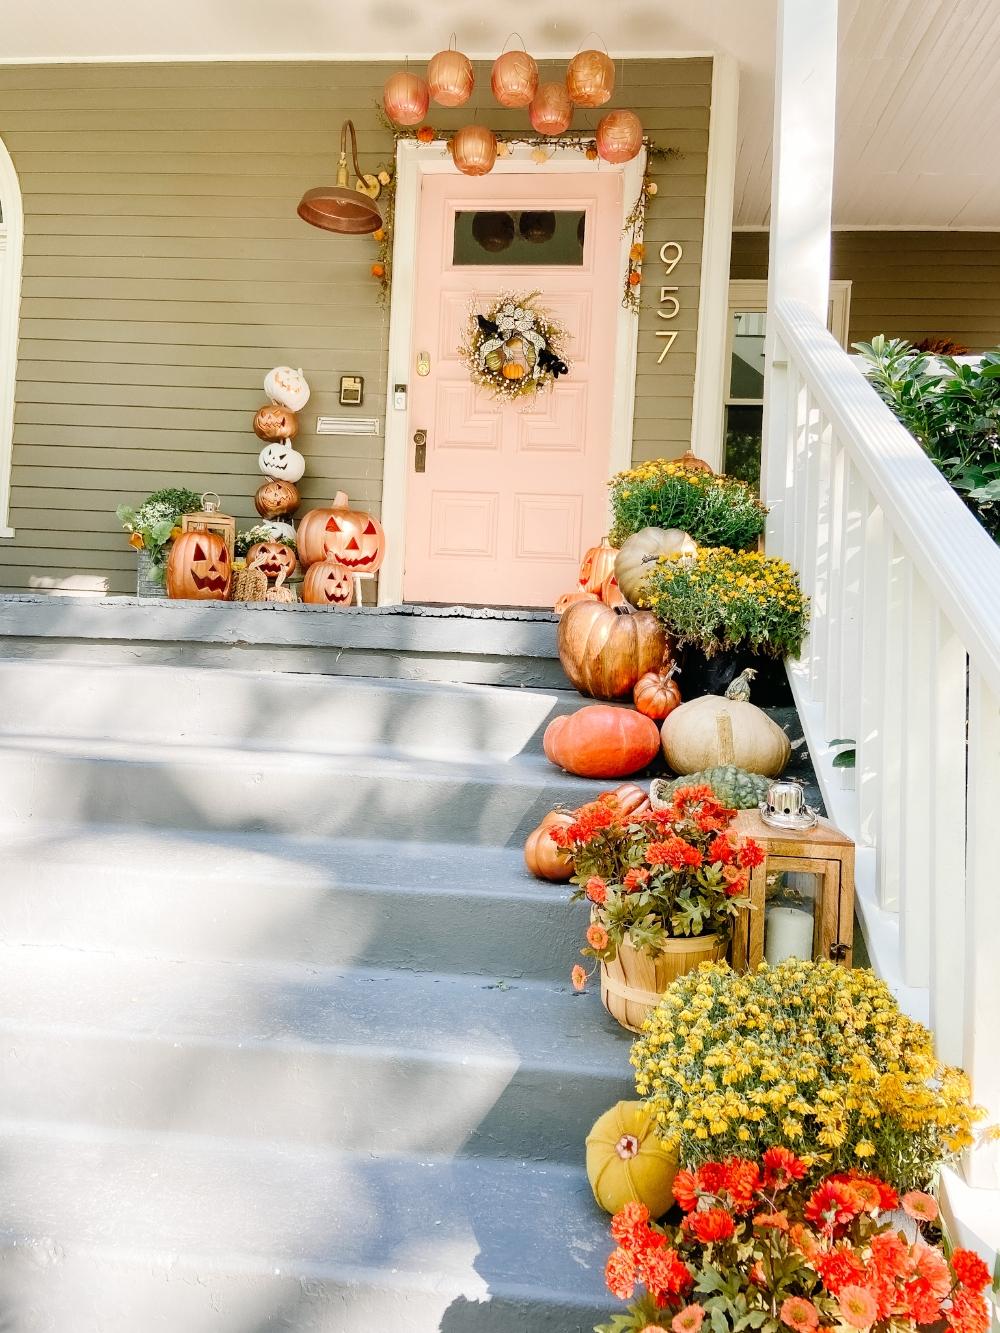 Halloween Porch! Spray paint inexpensive jack-o-lanterns, pumpkin pails and make a jack-o-lantern topiary for a festive pumpkin porch!